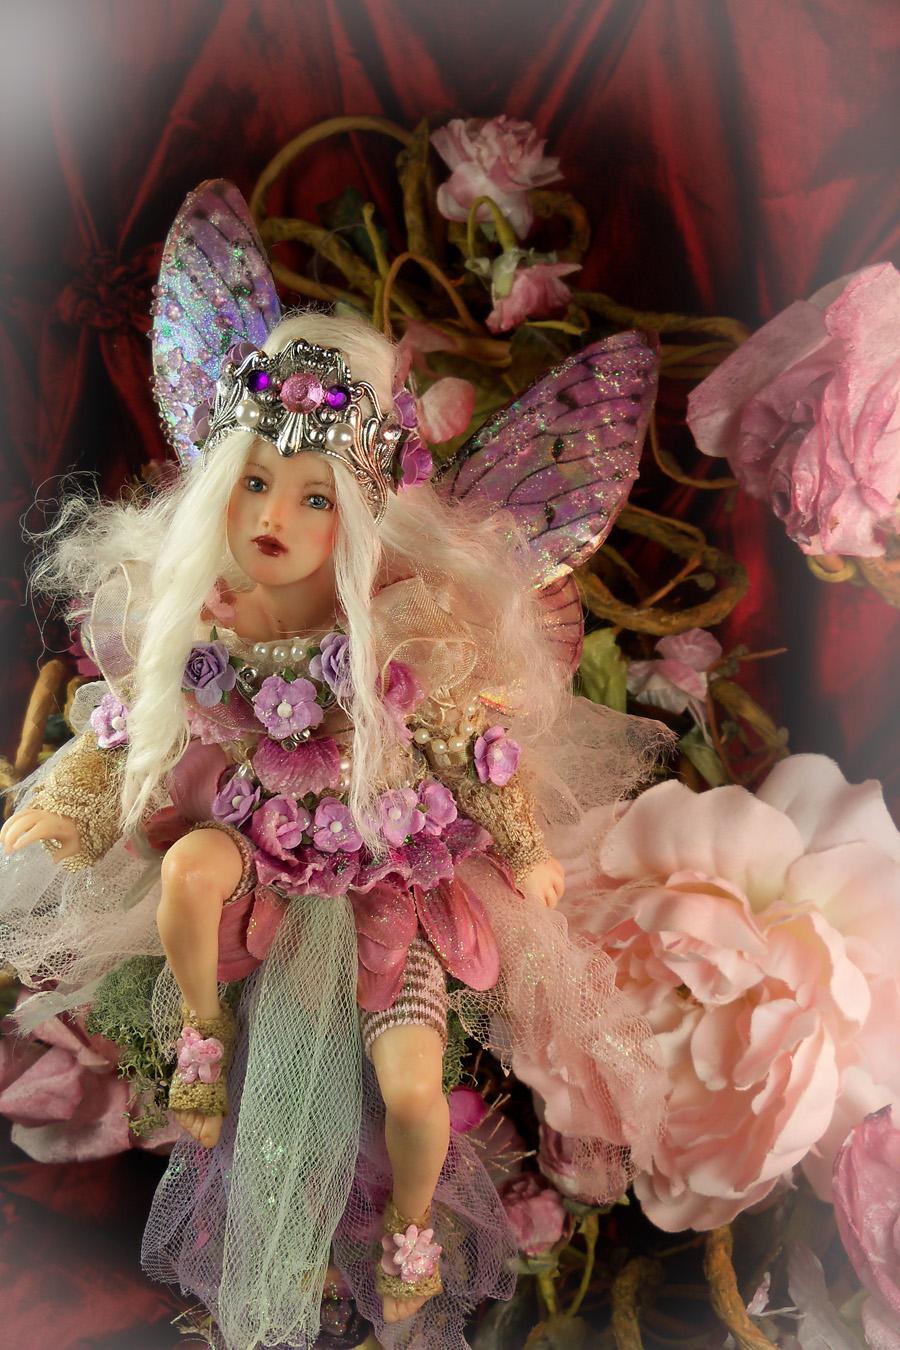 verona barrella ooak polymer clay art doll   fairy by veronabarrella image